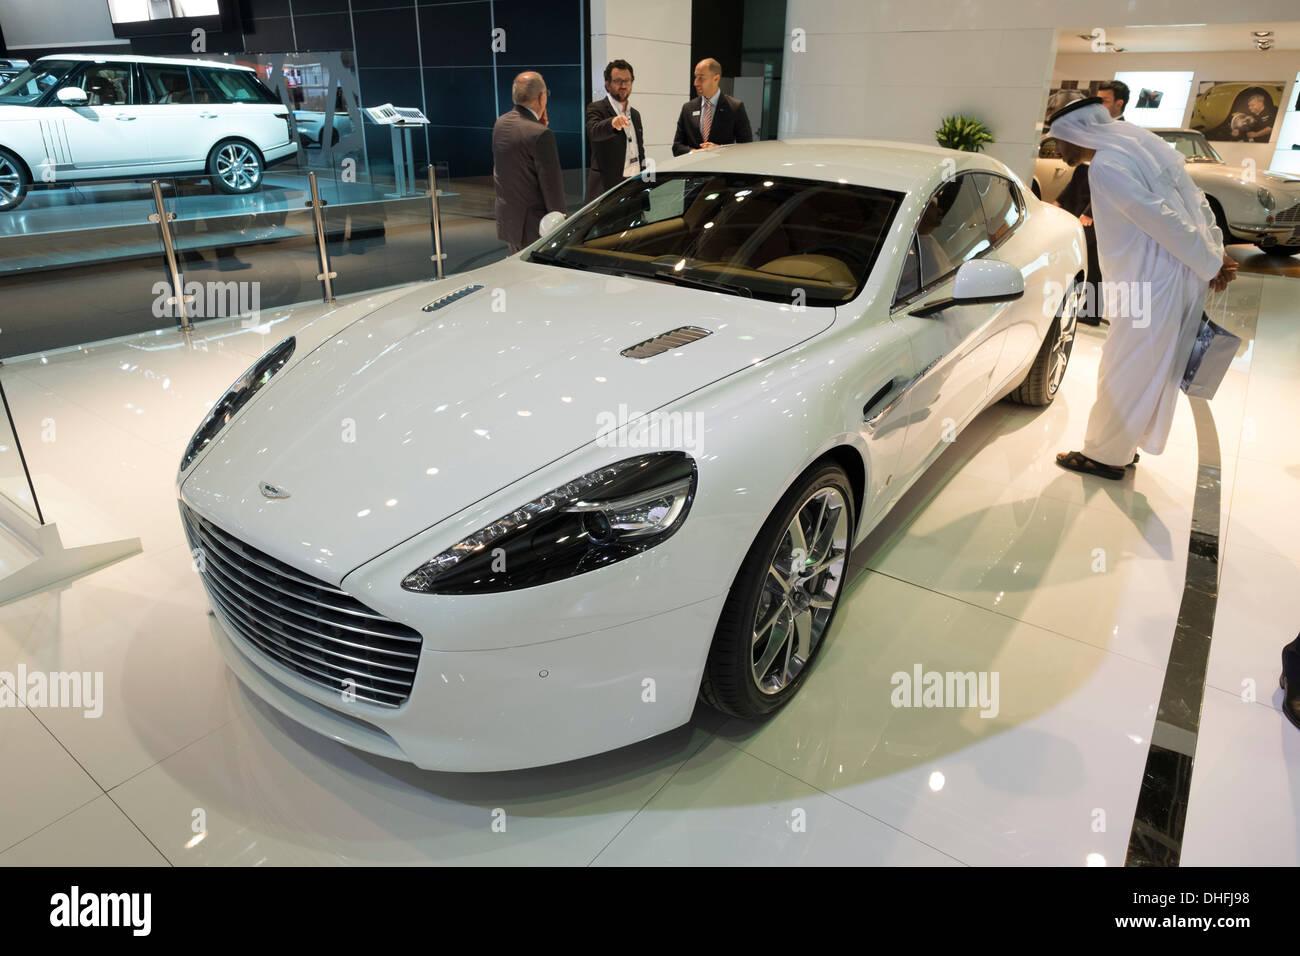 Aston Martin Rapide S at the Dubai Motor Show 2013 United Arab Emirates - Stock Image